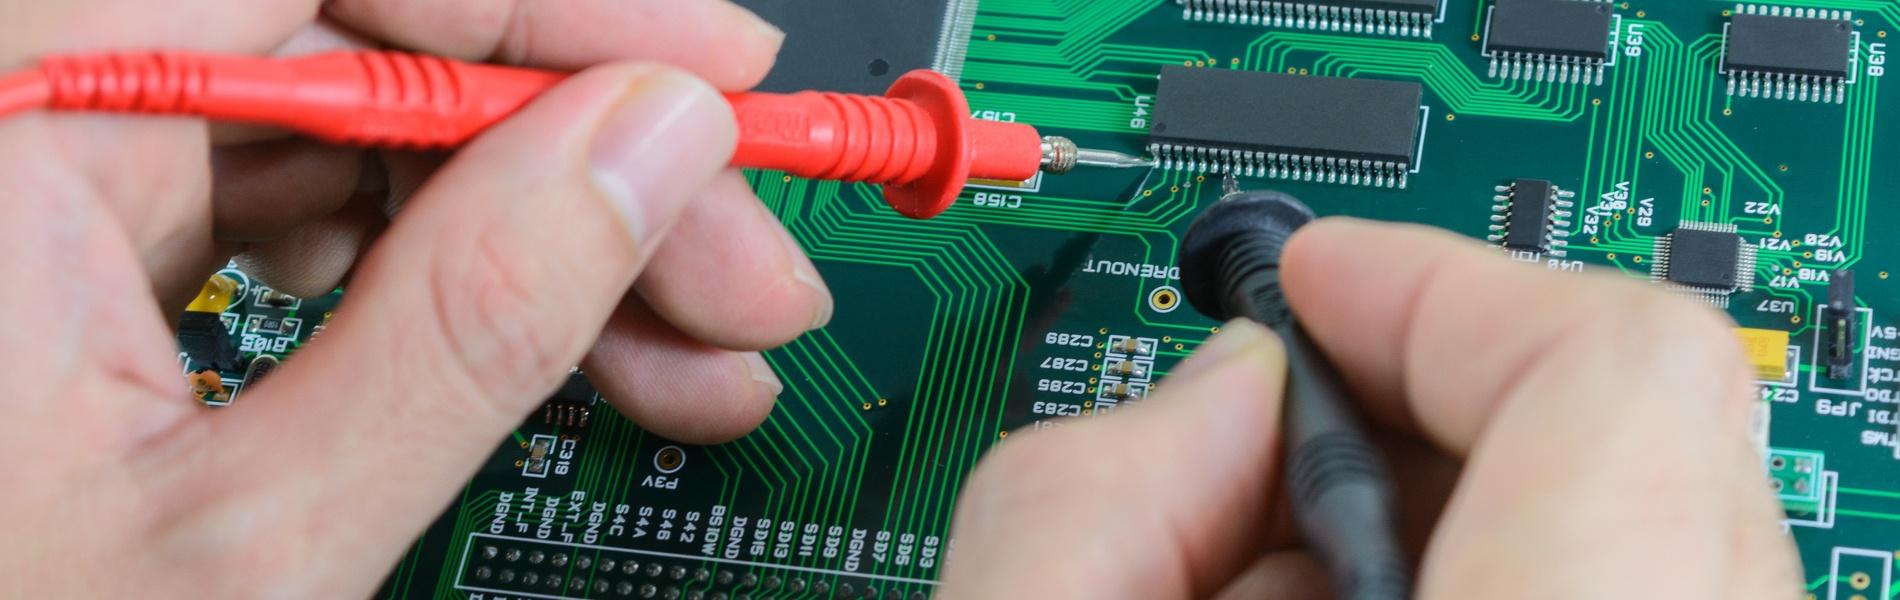 circuit_board_banner.jpg